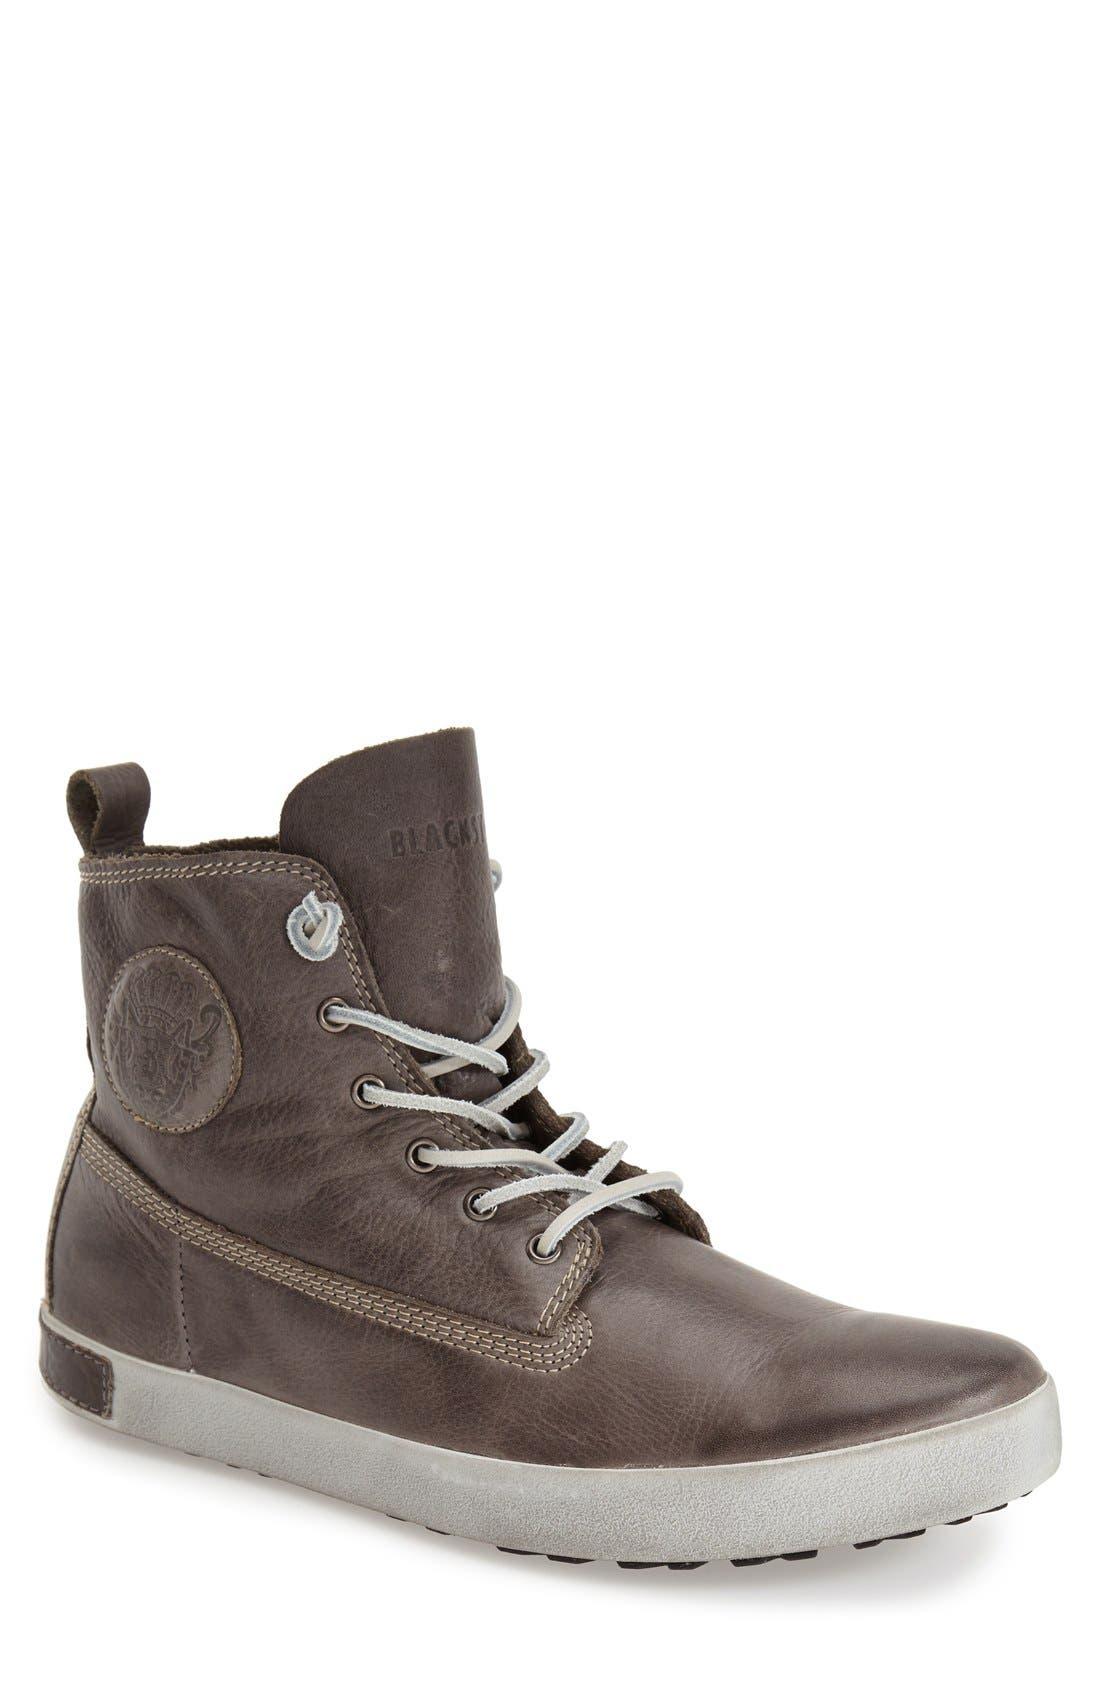 'JM04' Sneaker,                         Main,                         color, 081